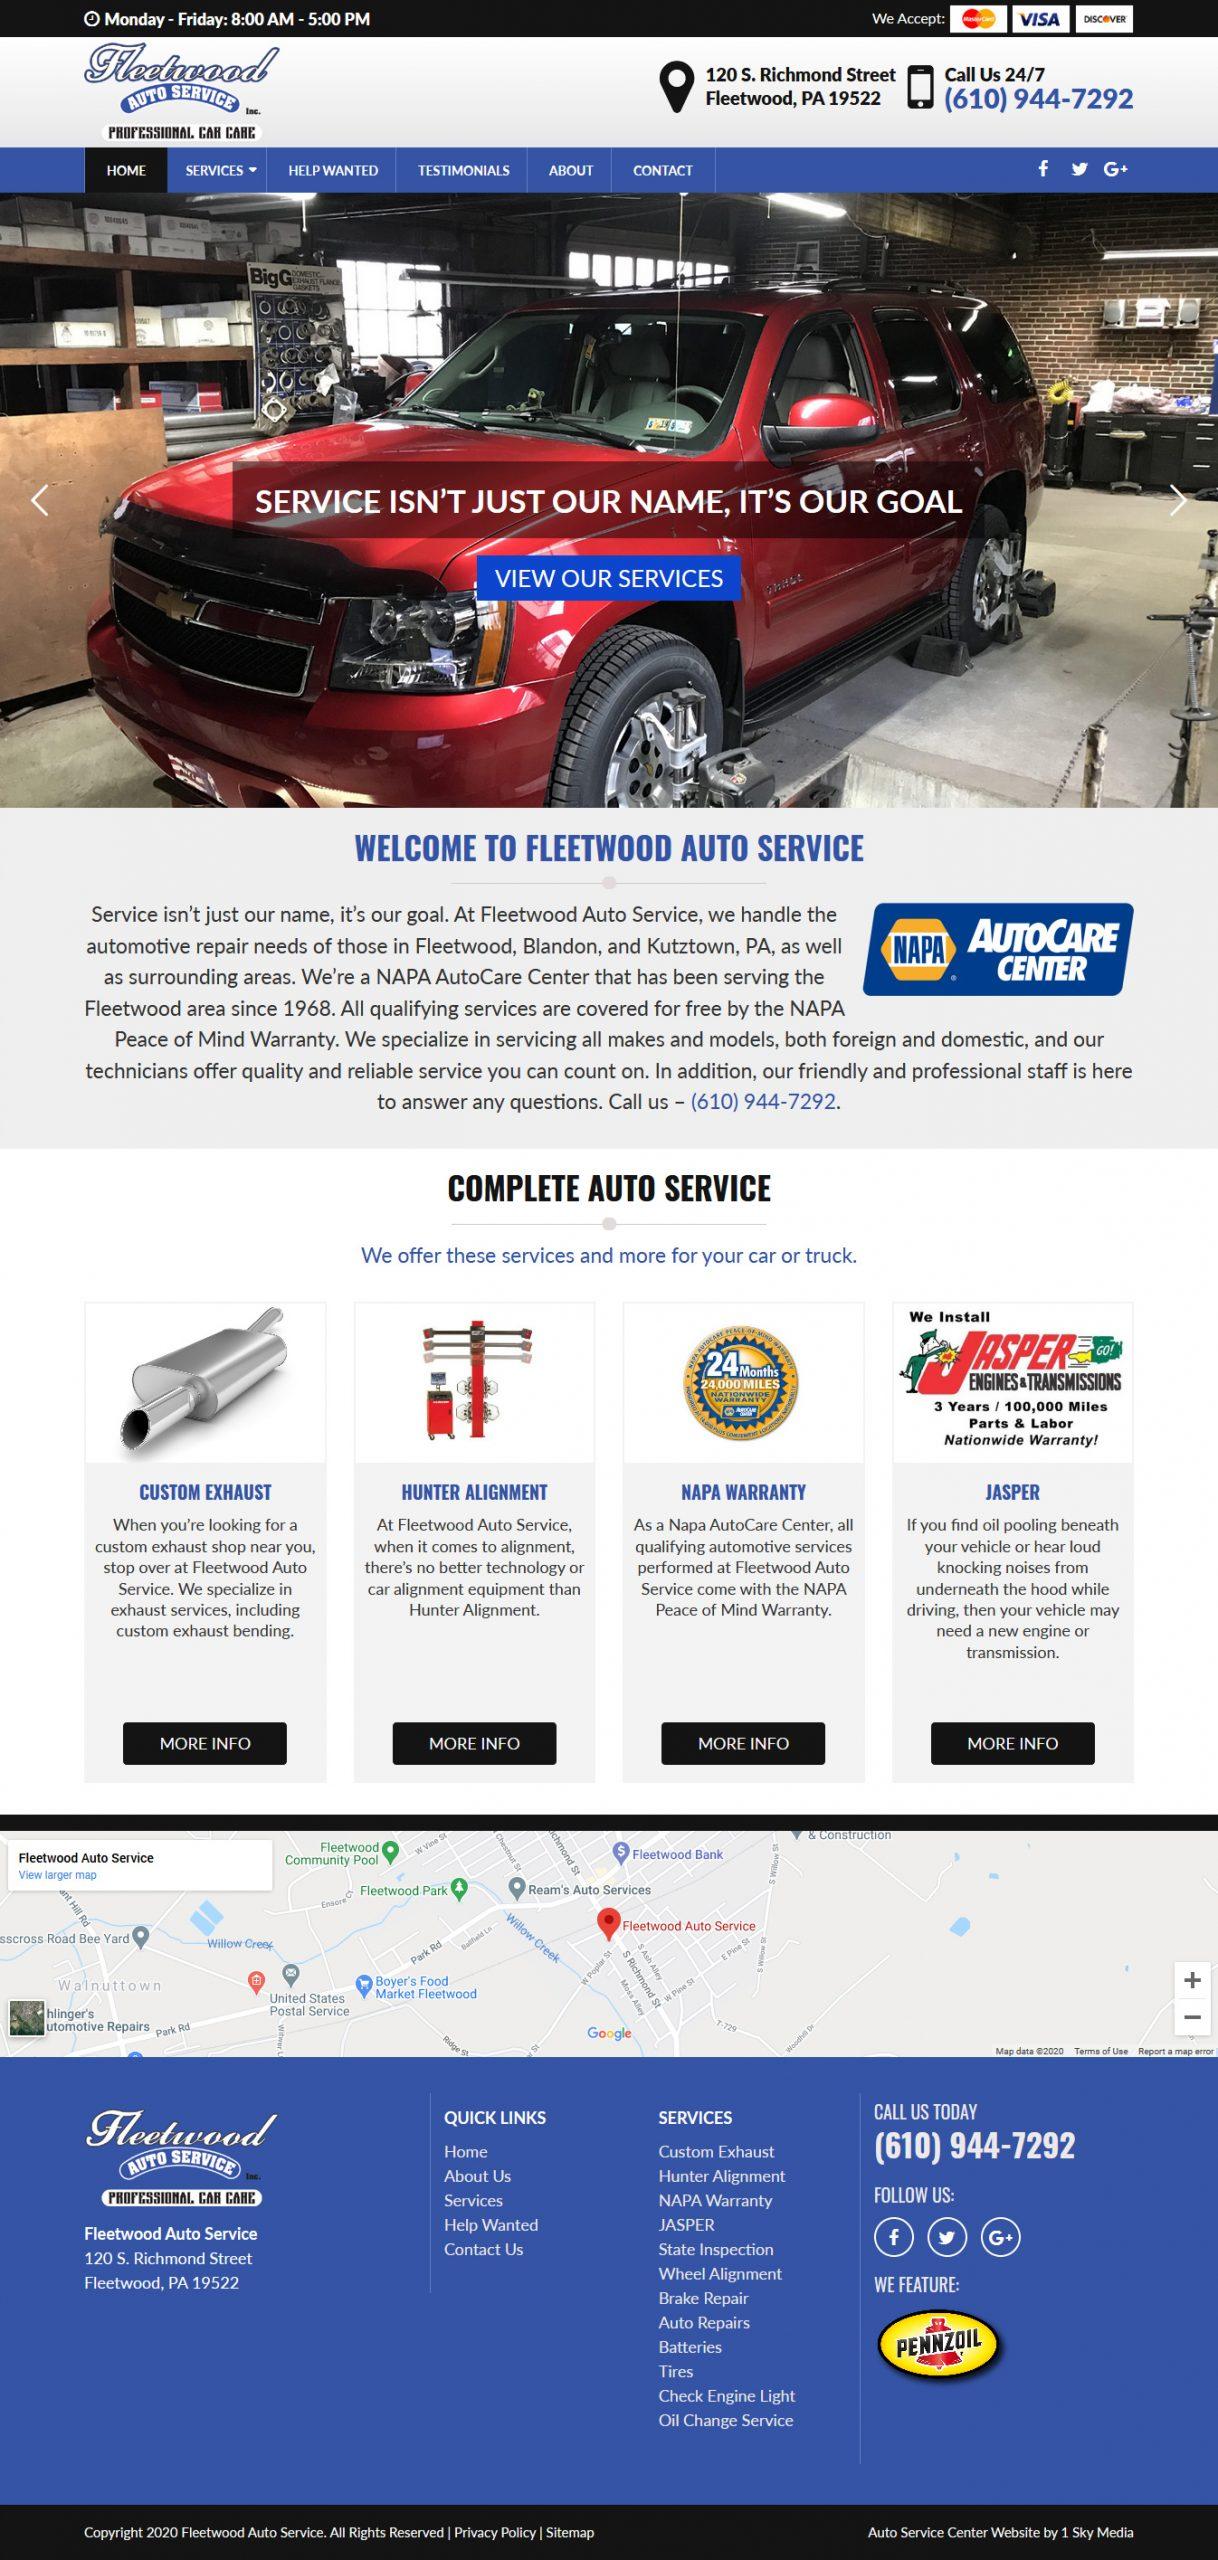 Fleetwood Auto Service Website Design